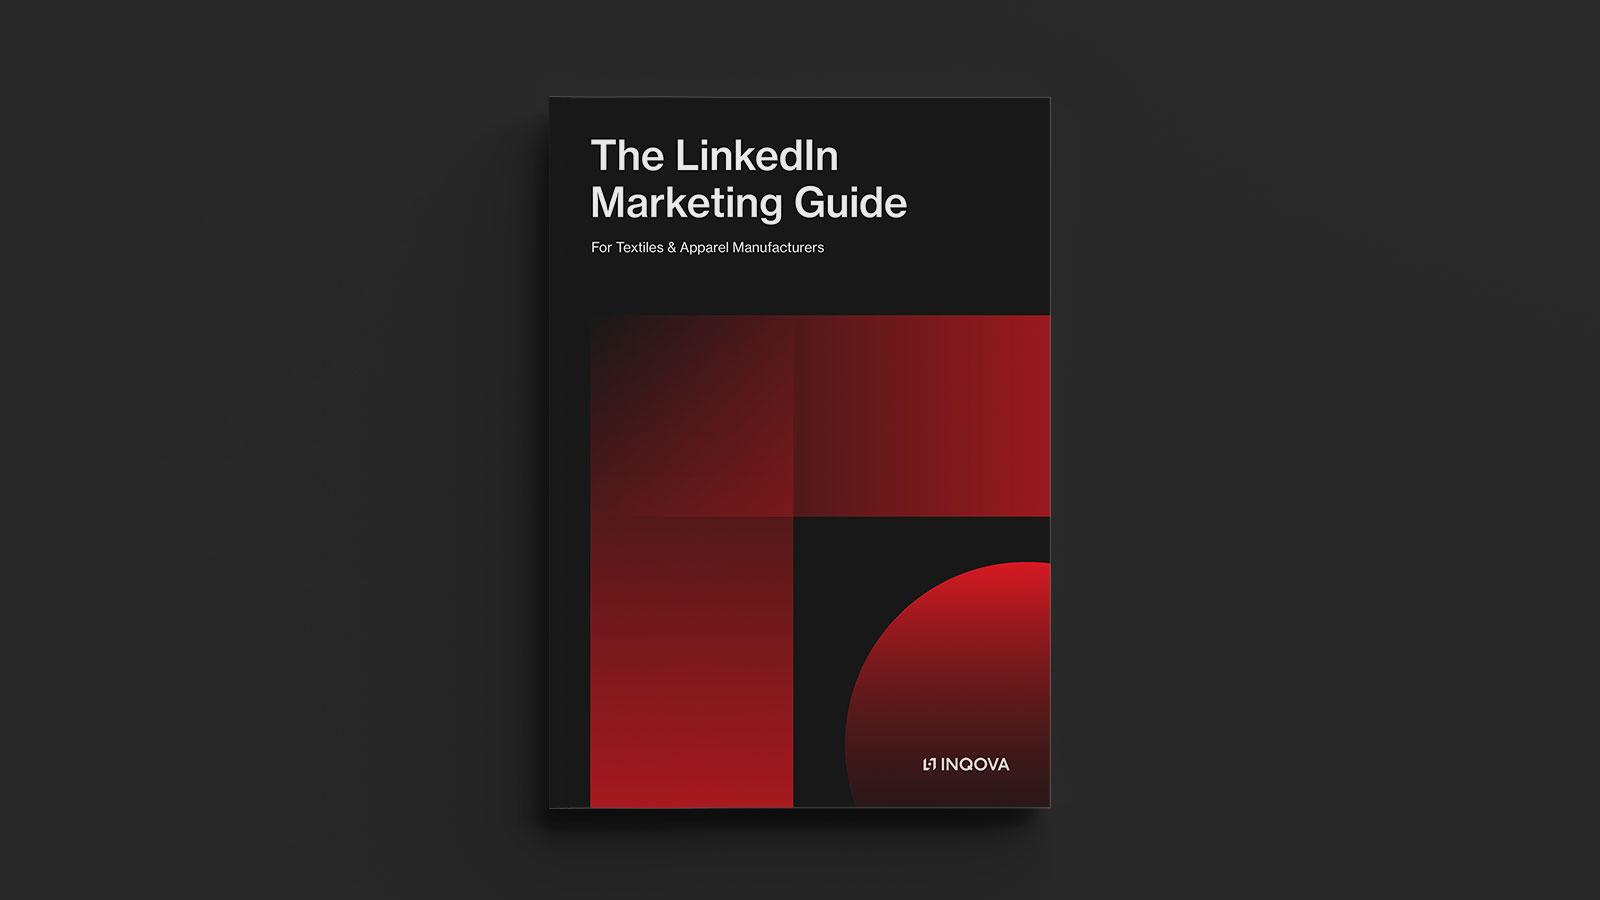 LinkedIn Marketing Guide Cover